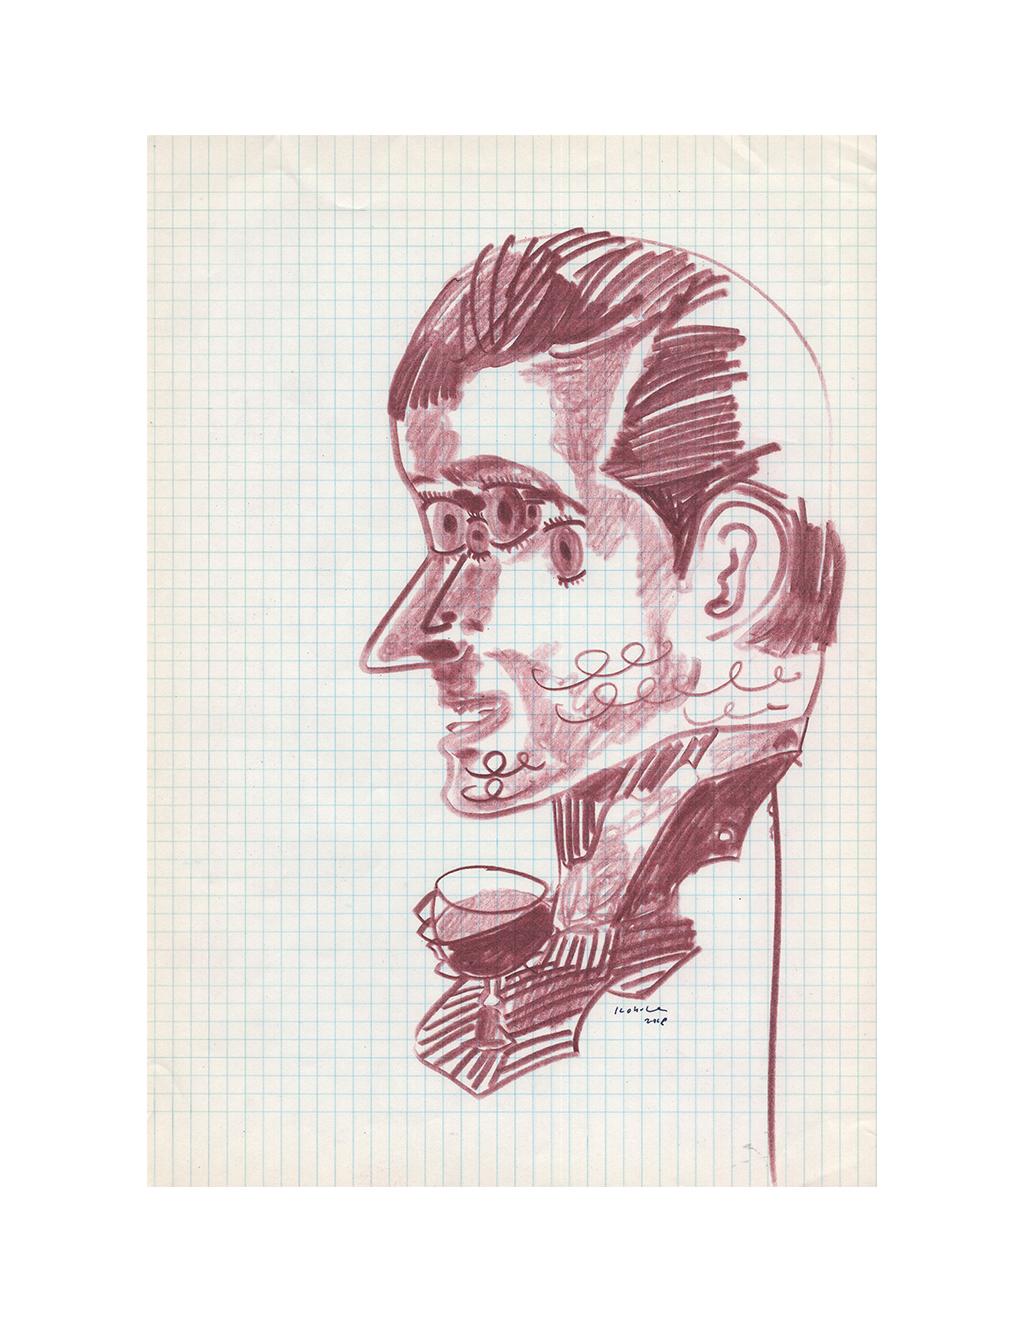 Drawing - The man 1909,   2018  21cm x 29.5cm  Colour pencils on paper